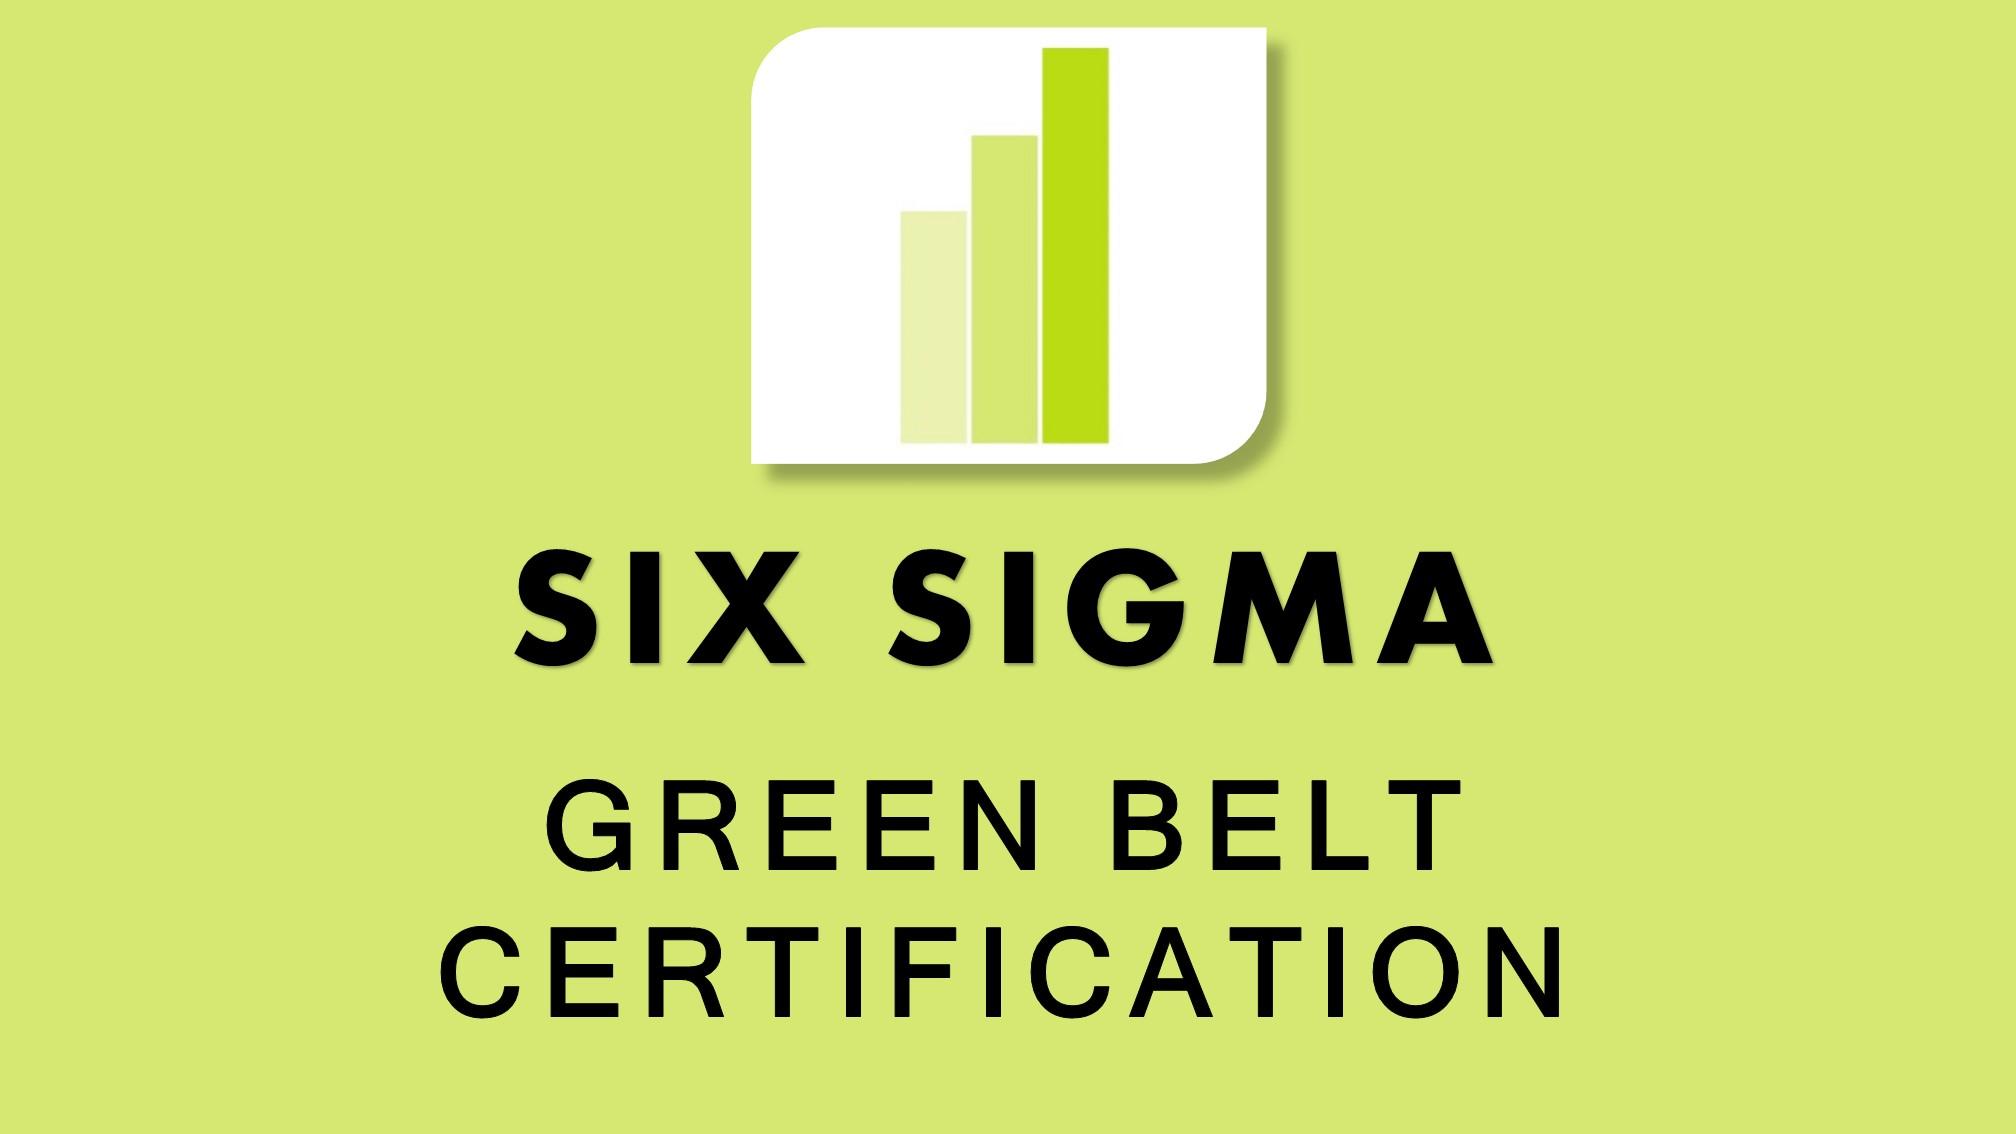 Six sigma green belt training course and certification australia six sigma green belt training course and certification australia two consulting xflitez Choice Image